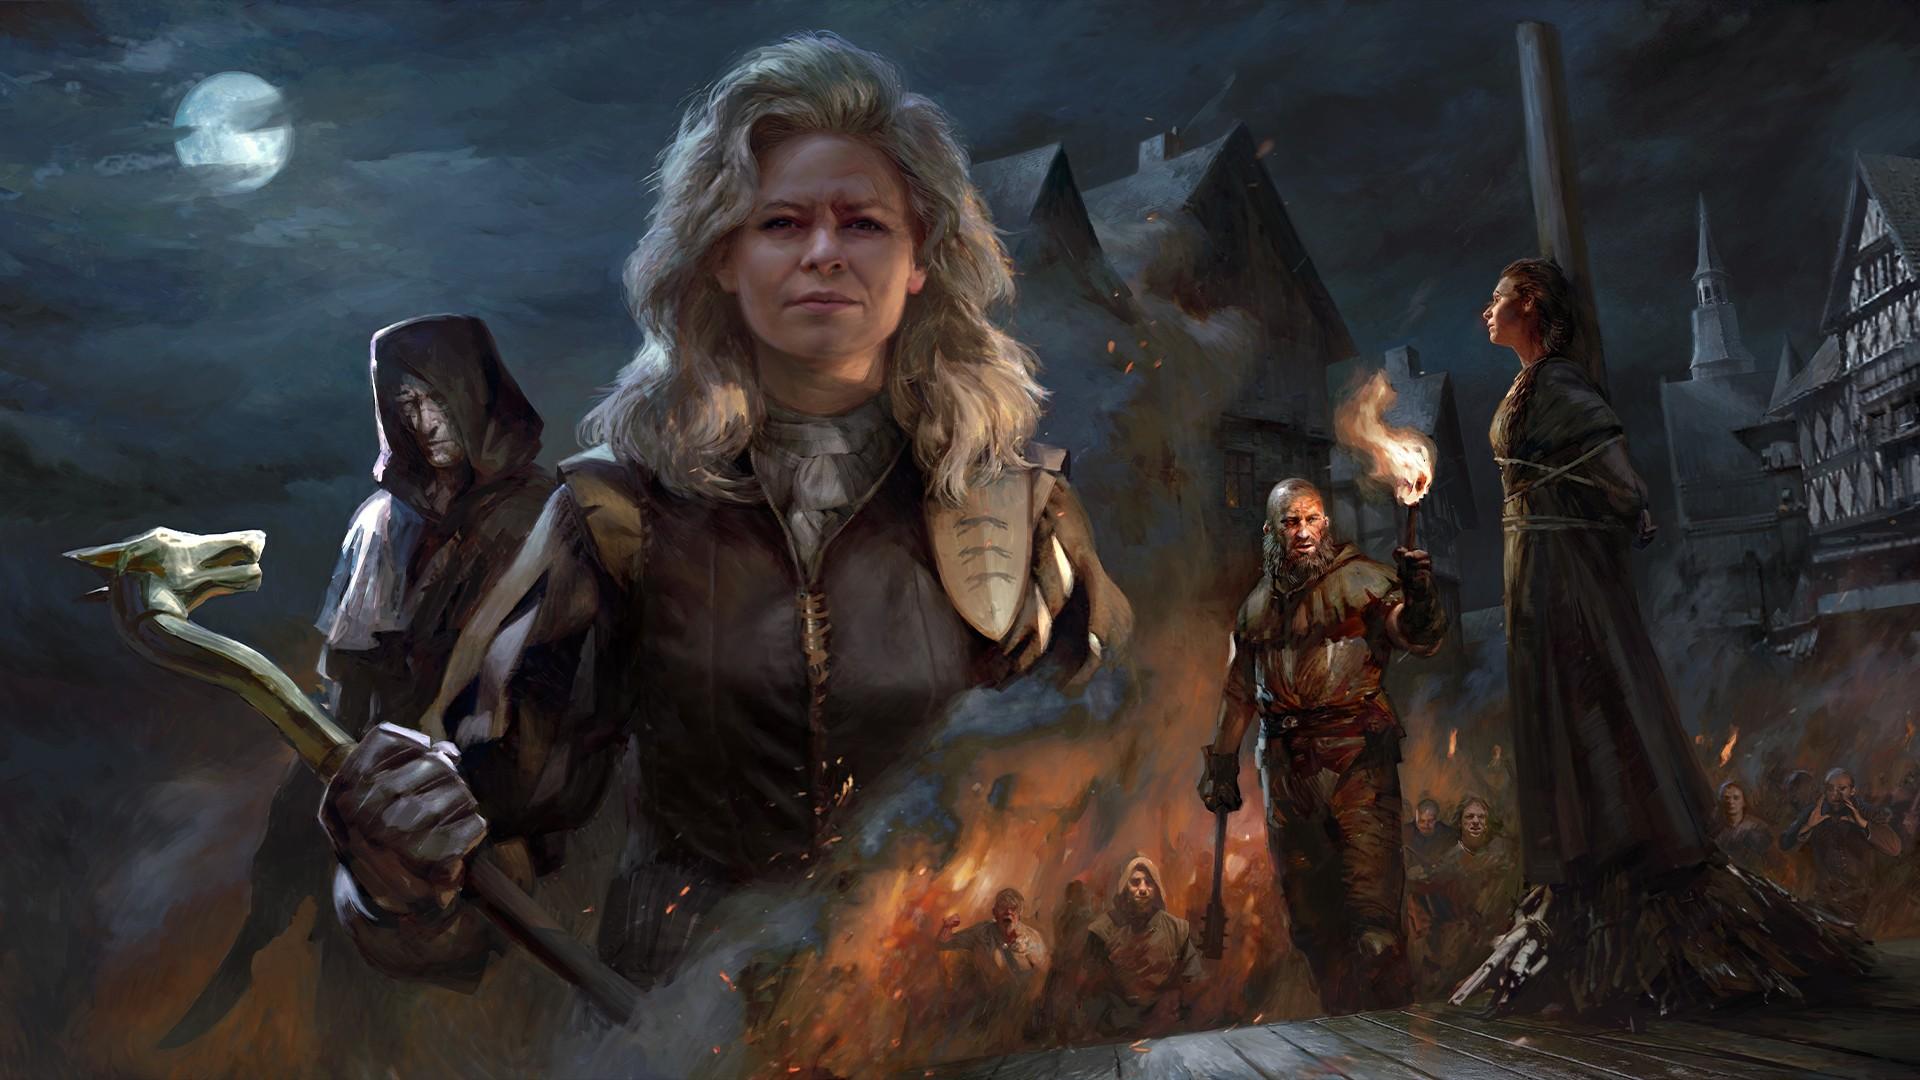 GWENT: The Witcher Card Game arriverà su PC, Mac Apple M1, iOS e Android l'8 giugno 2021